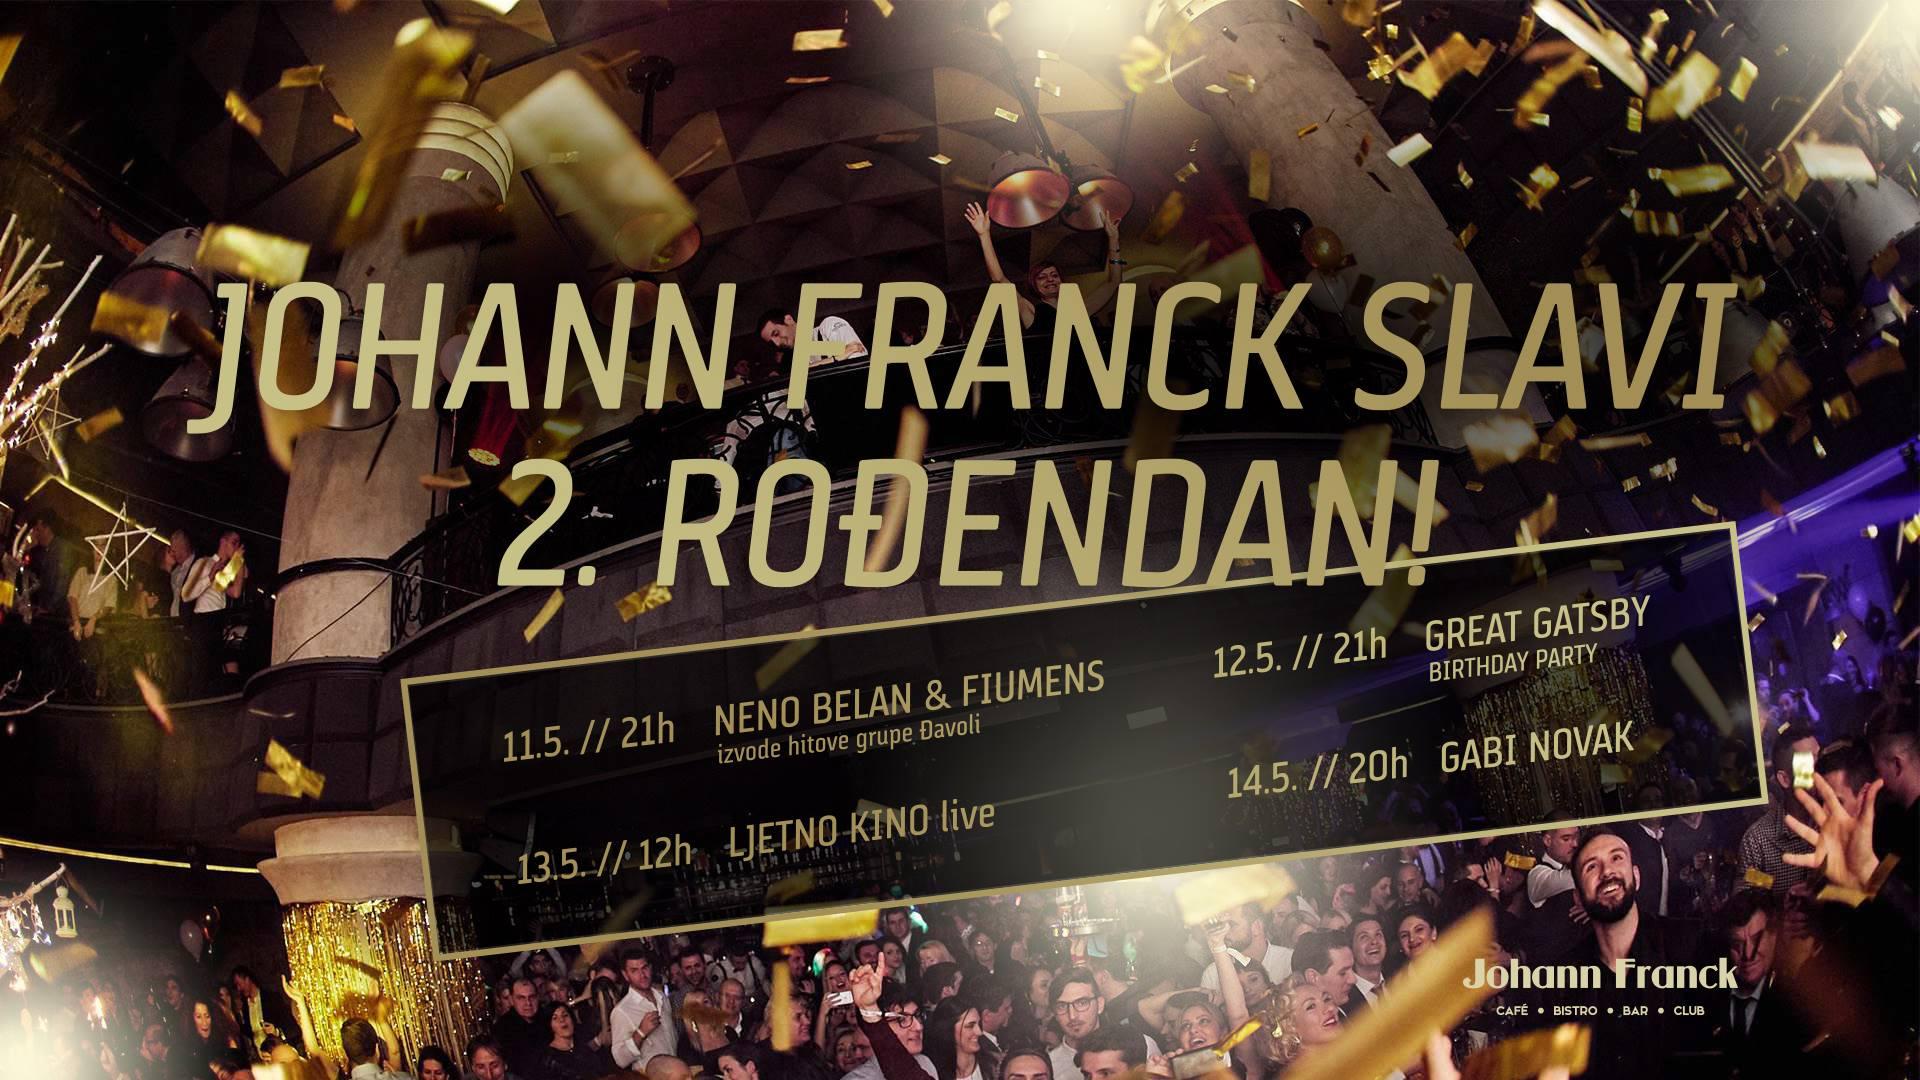 FOTO: Veselo proslavljen drugi rođendan kluba Johann Franck